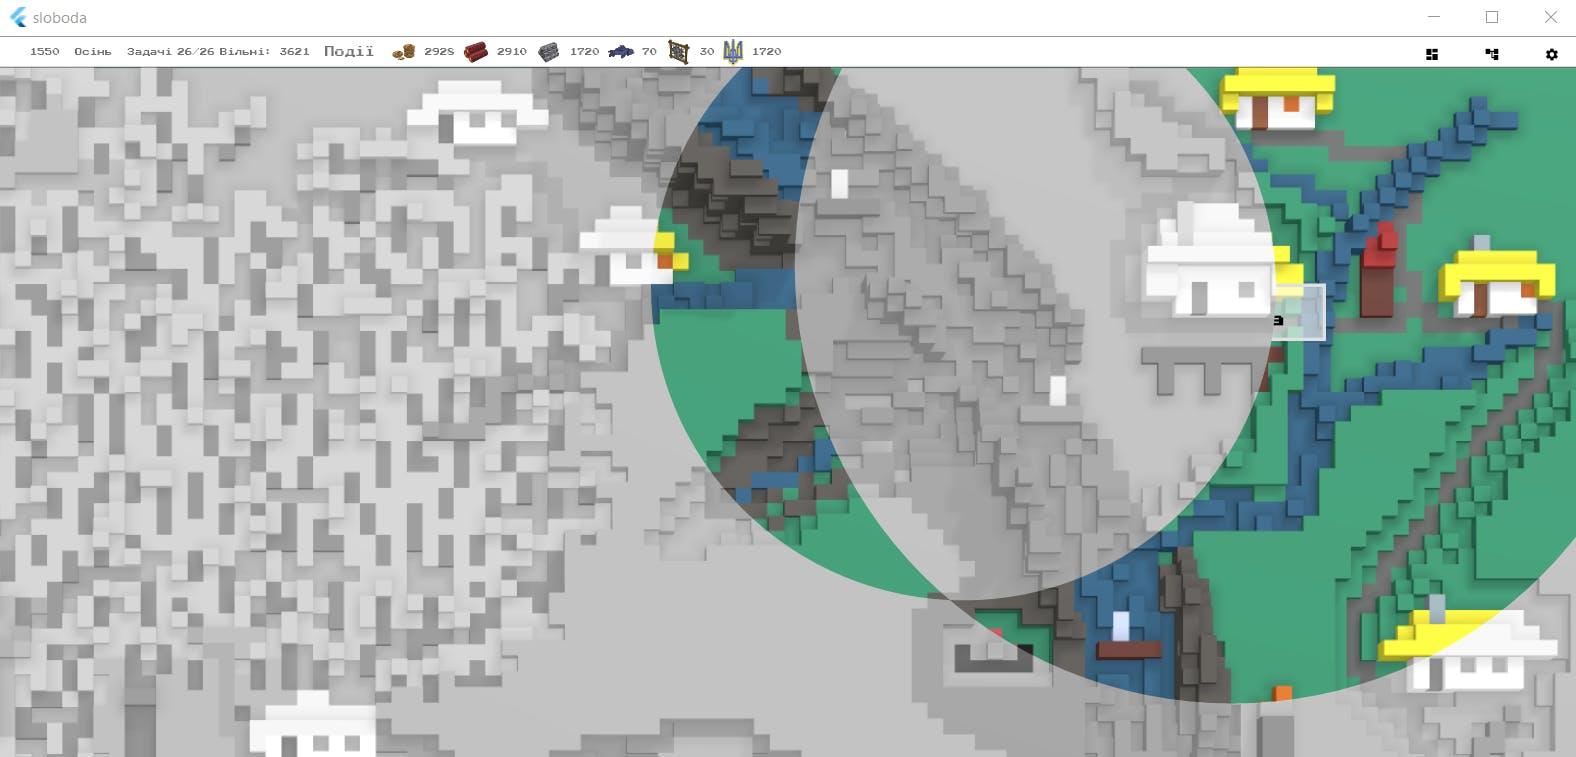 Screenshot 2020-12-01 231002.png